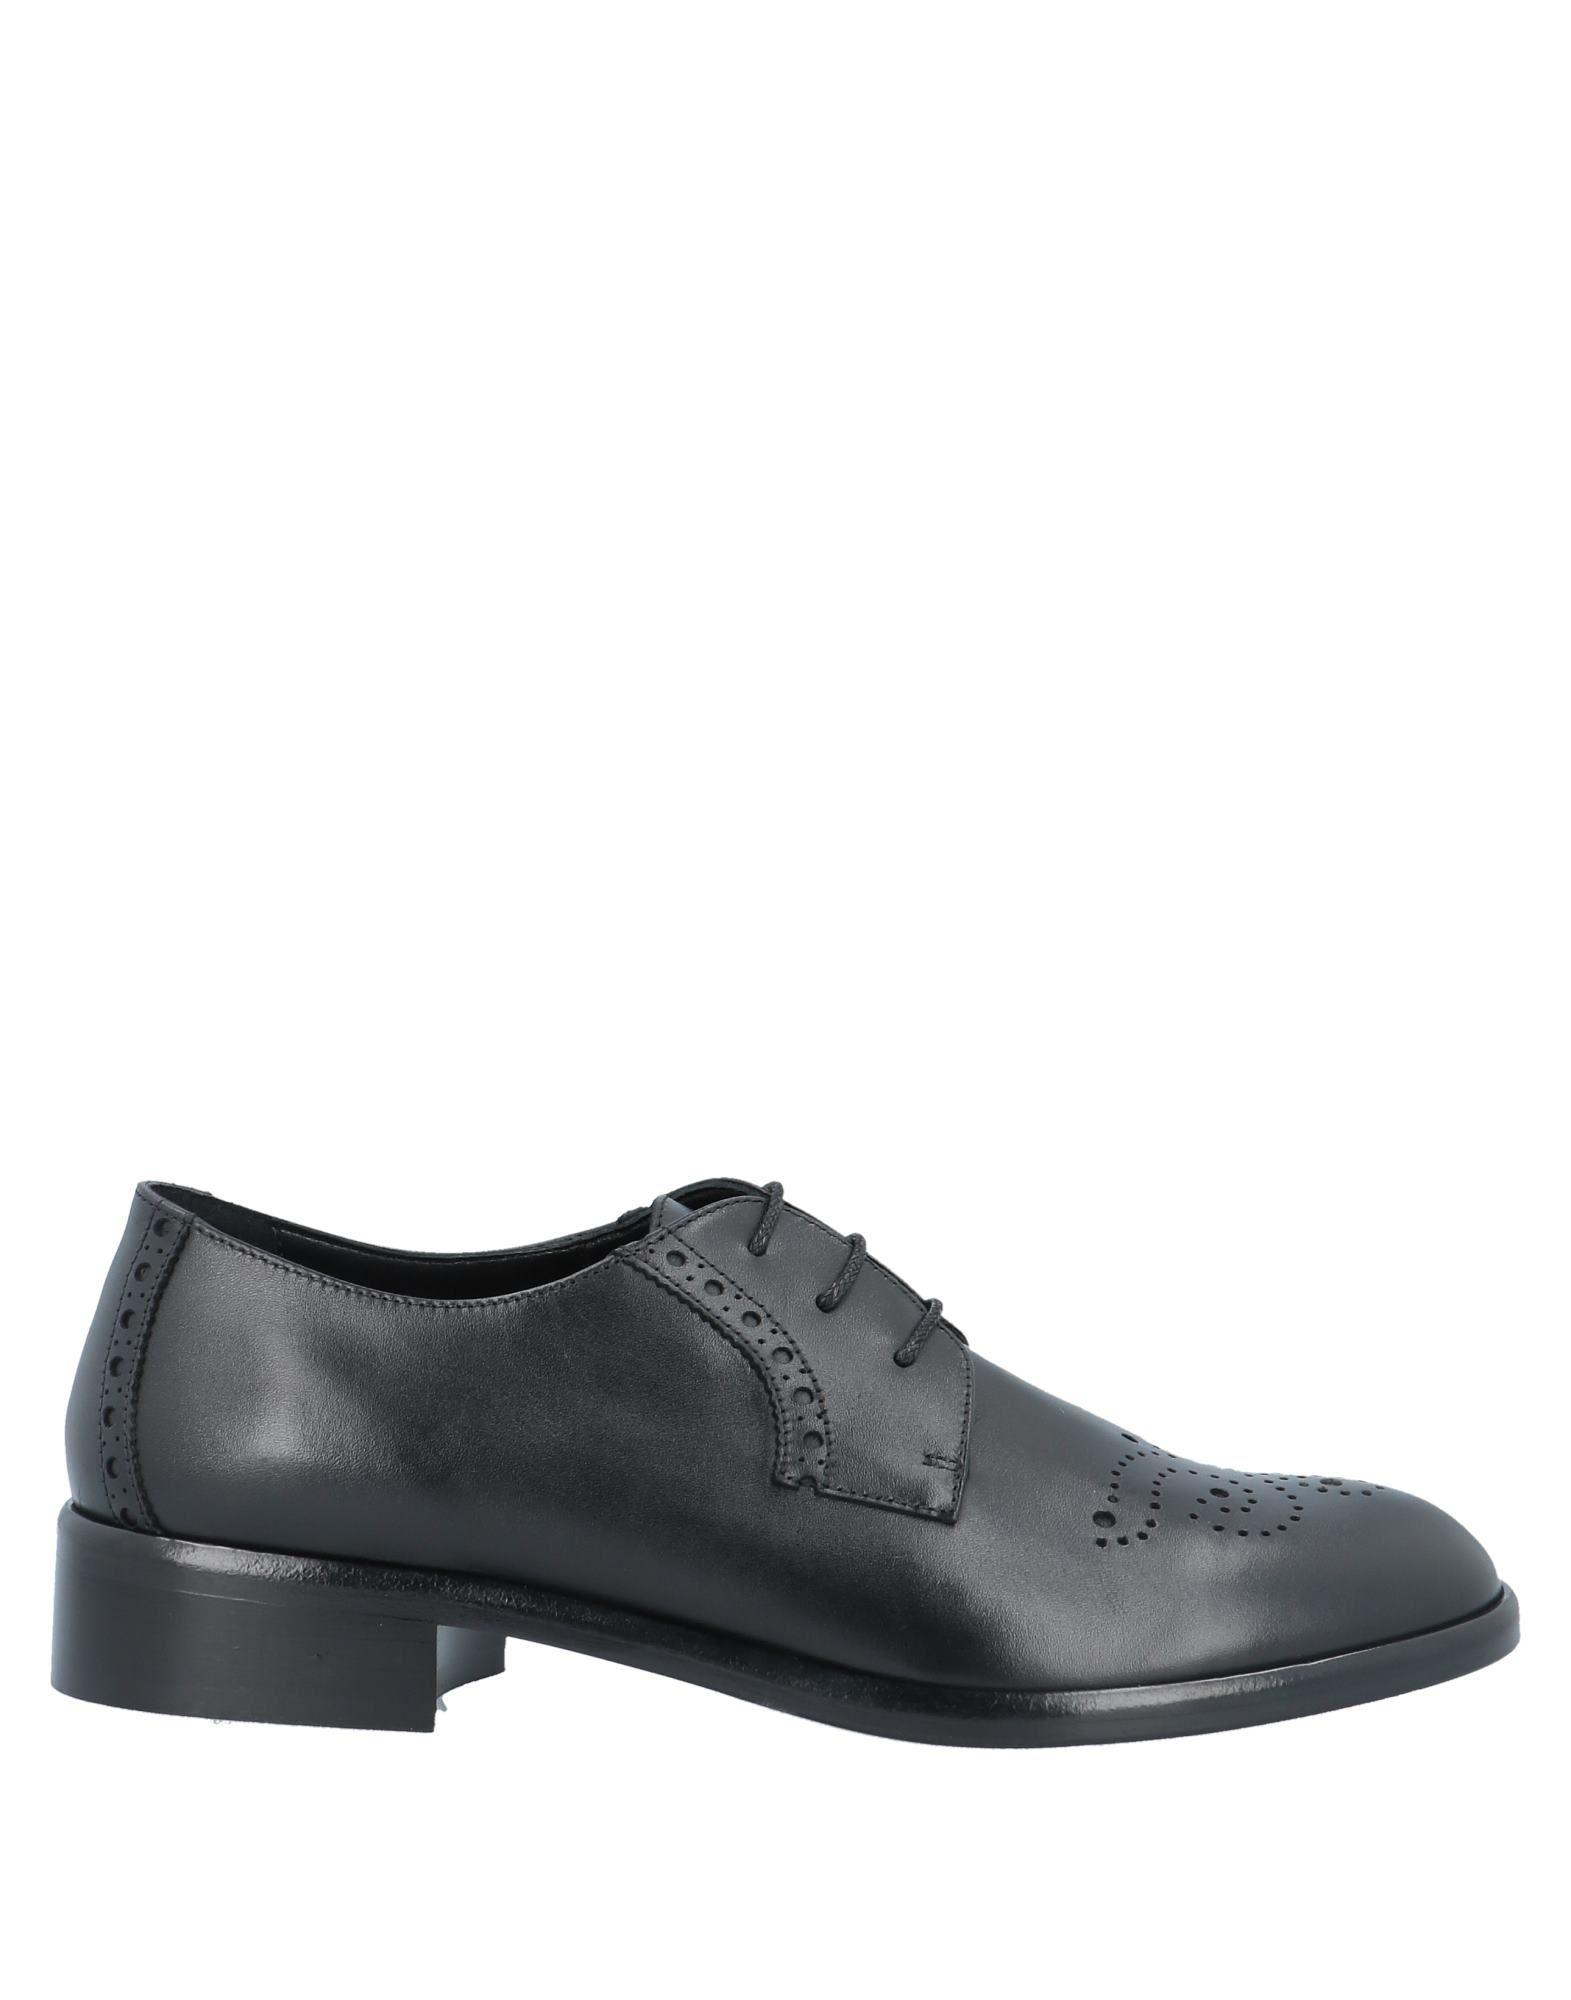 LA CORTE DELLA PELLE by FRANCO BALLIN Обувь на шнурках